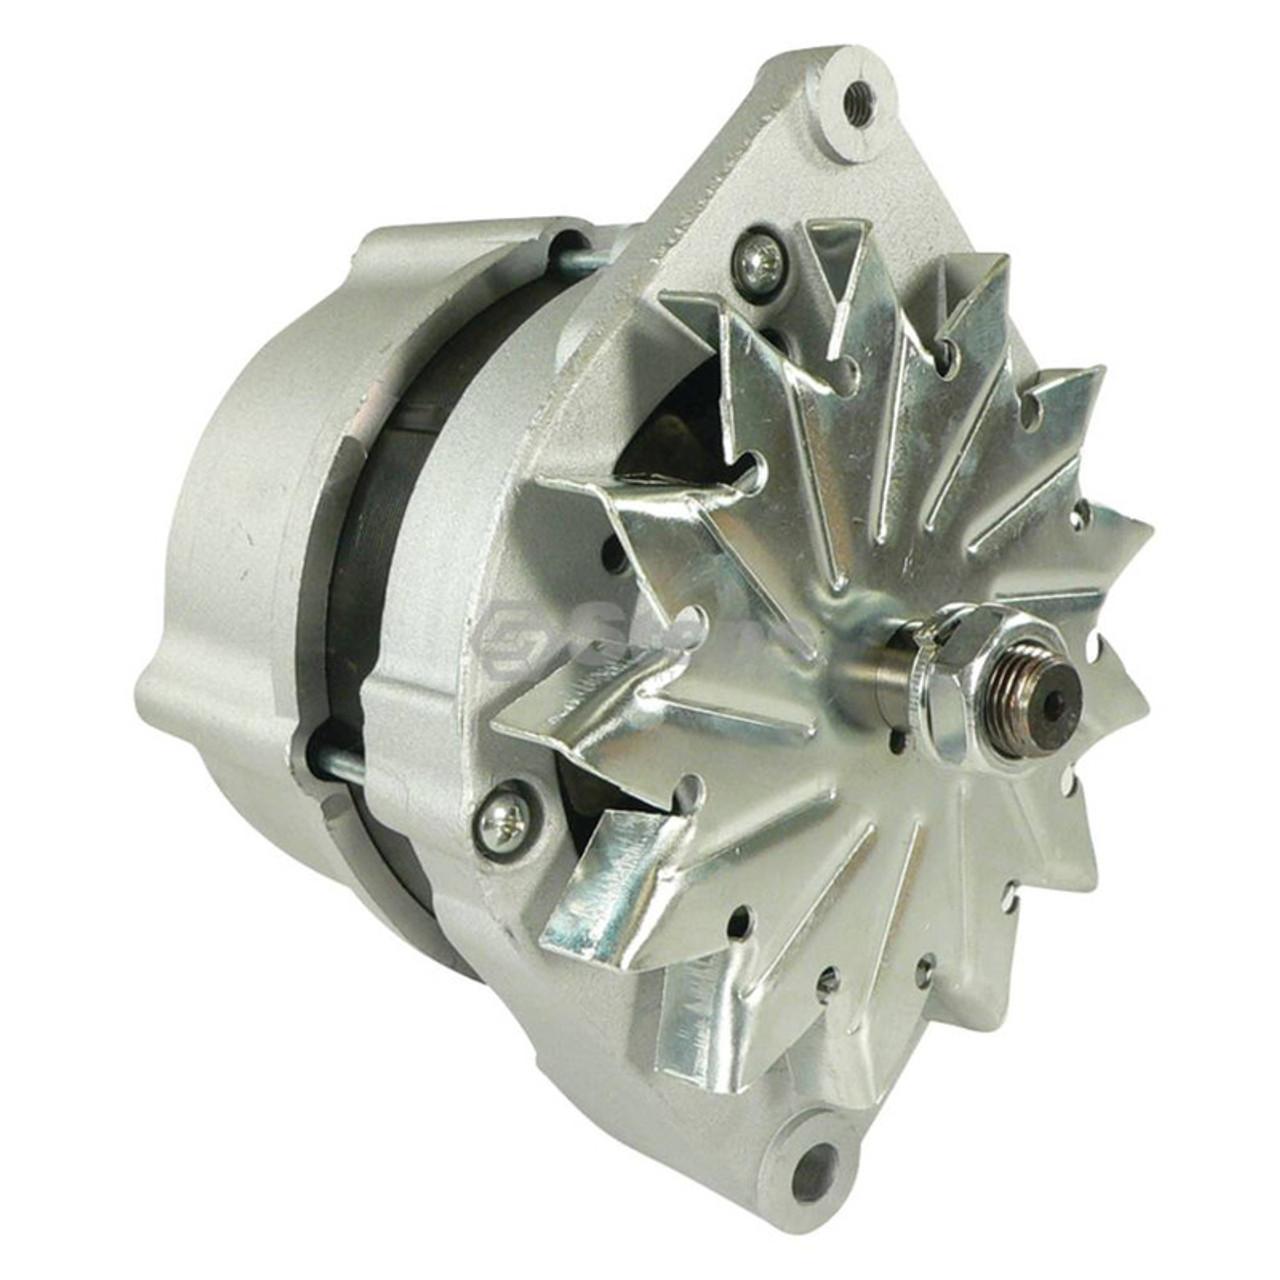 Alternator for Case 1150H, 1818, 1835C, 1835C, 1840, 1845C, 1896, 2096, 25+4, 360, 4000, 4000, 4000, 4000, 40XT, A187873, AR187873